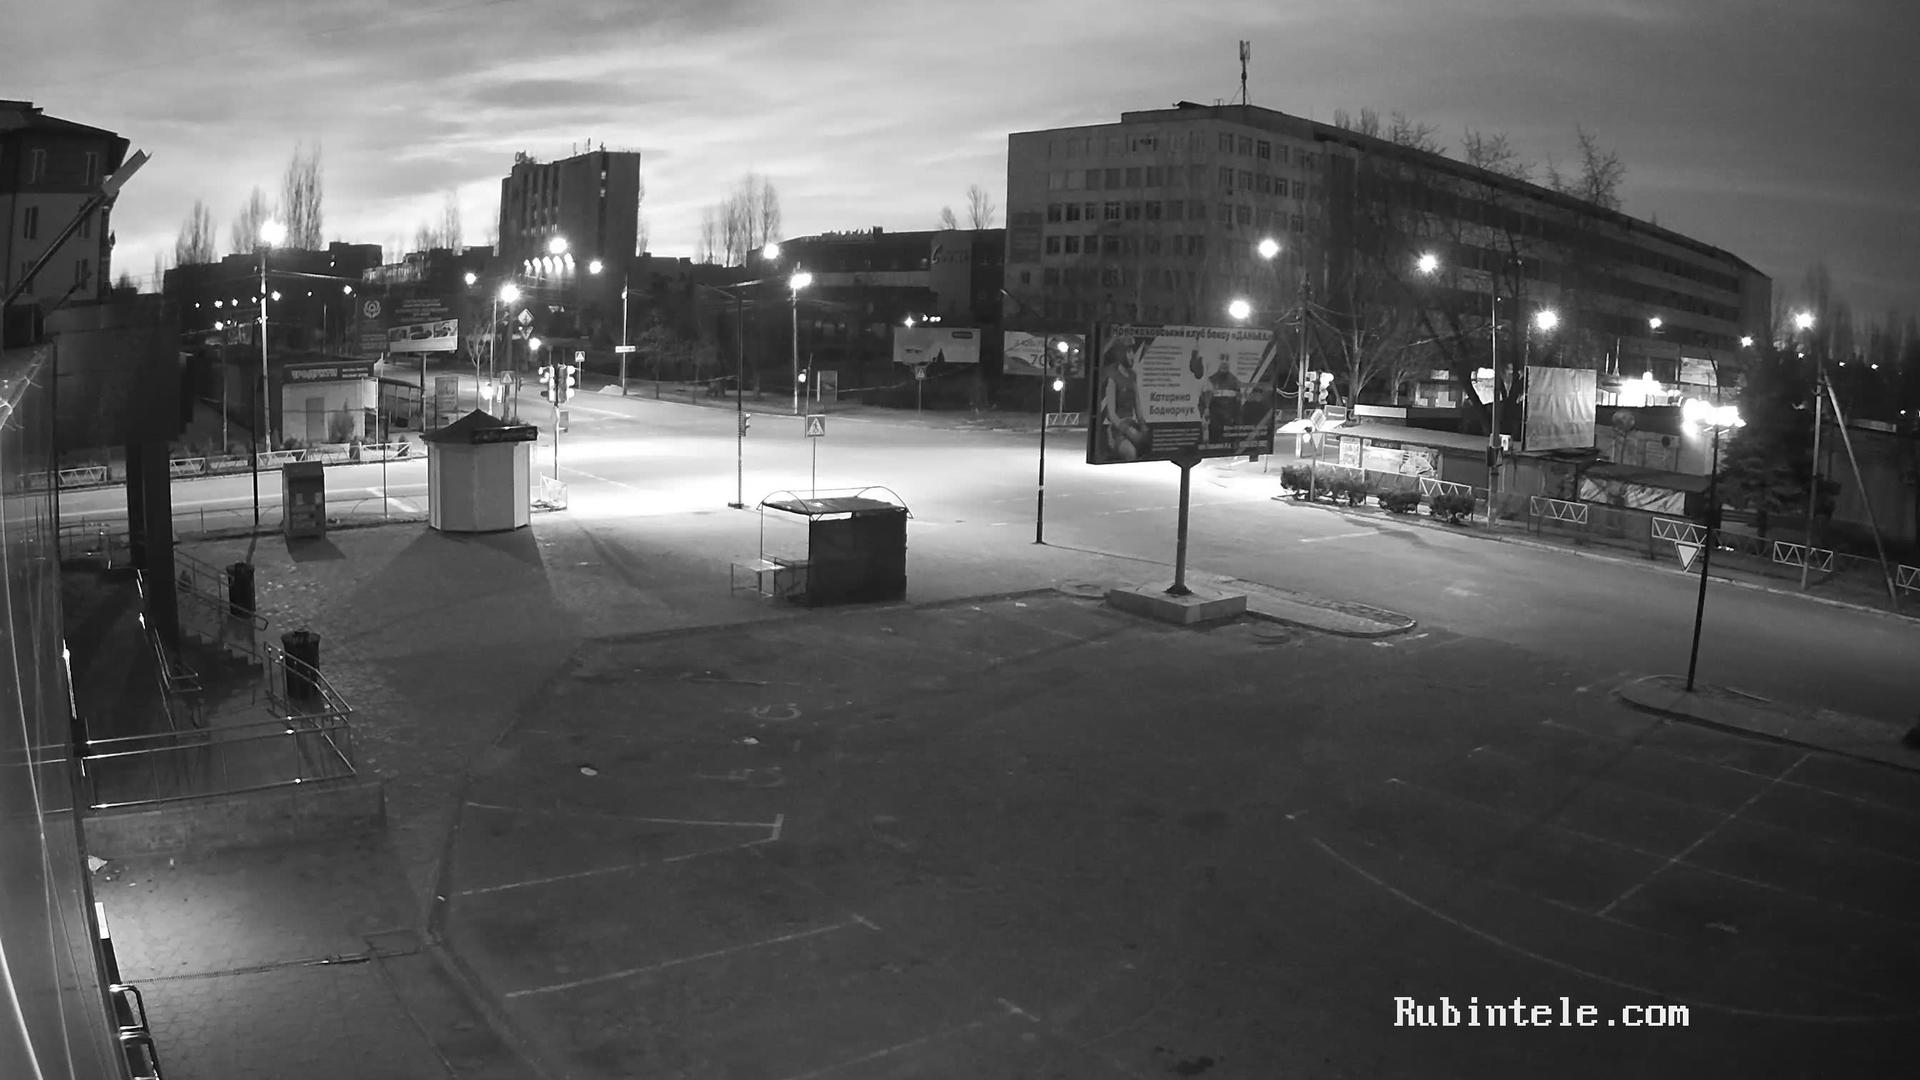 Webcam Нова Каховка: АТБ маркет